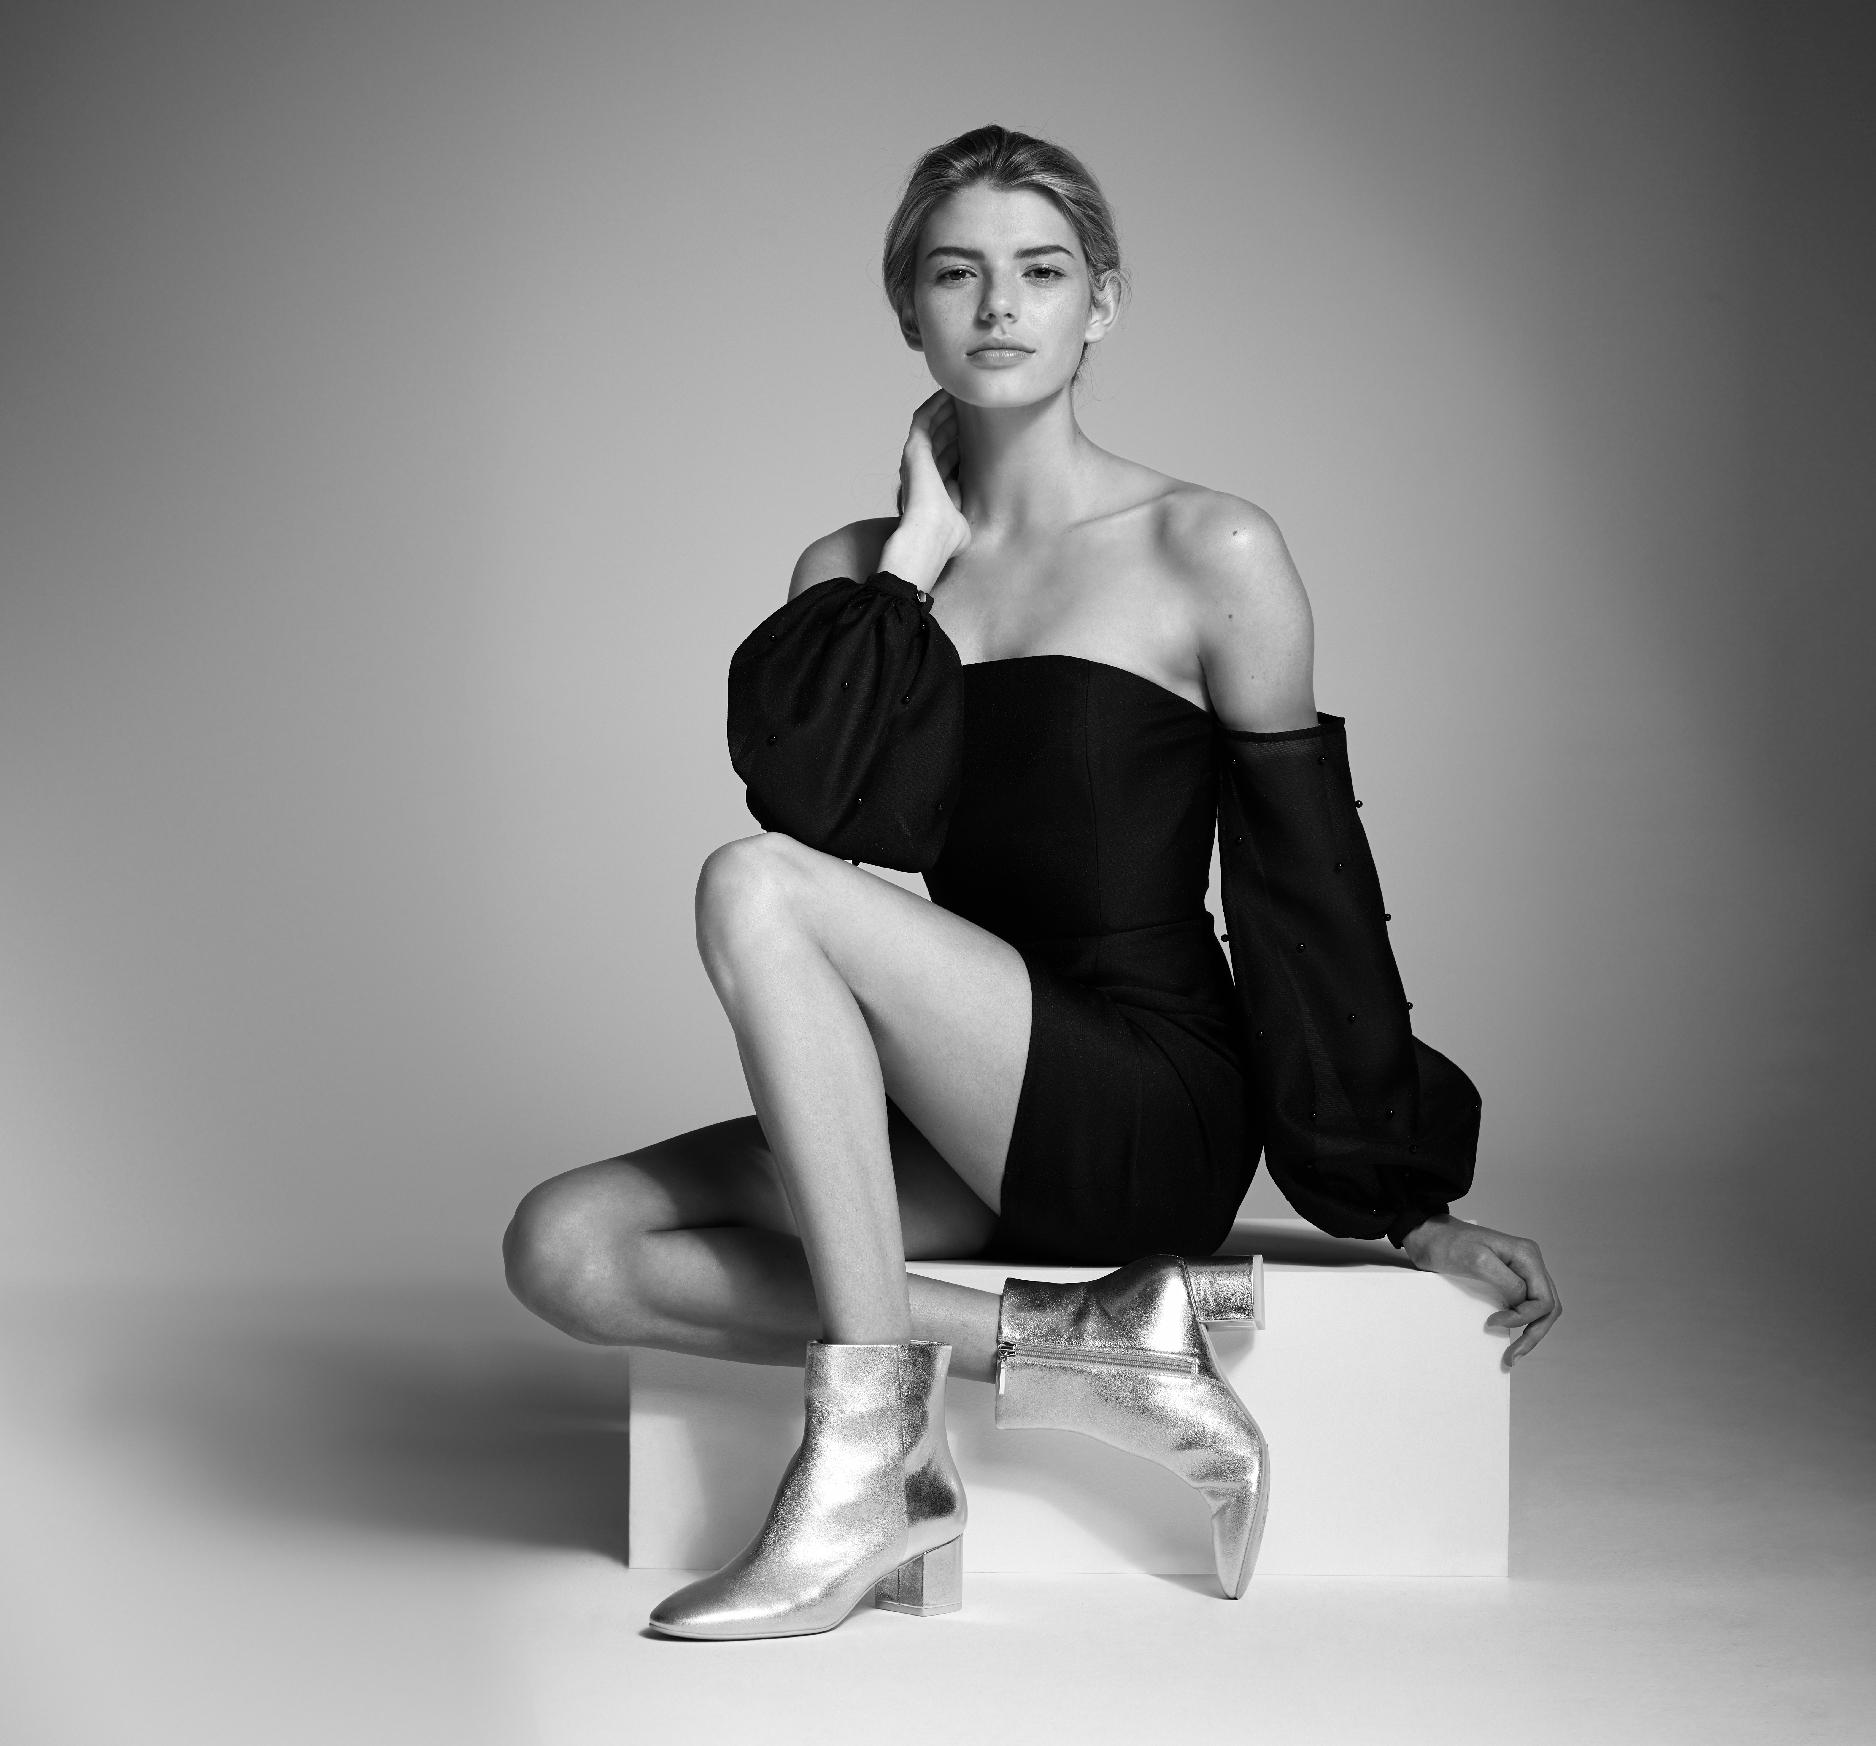 Wittner Brand Advertising still of model girl sitting on a white block wearing silver boots